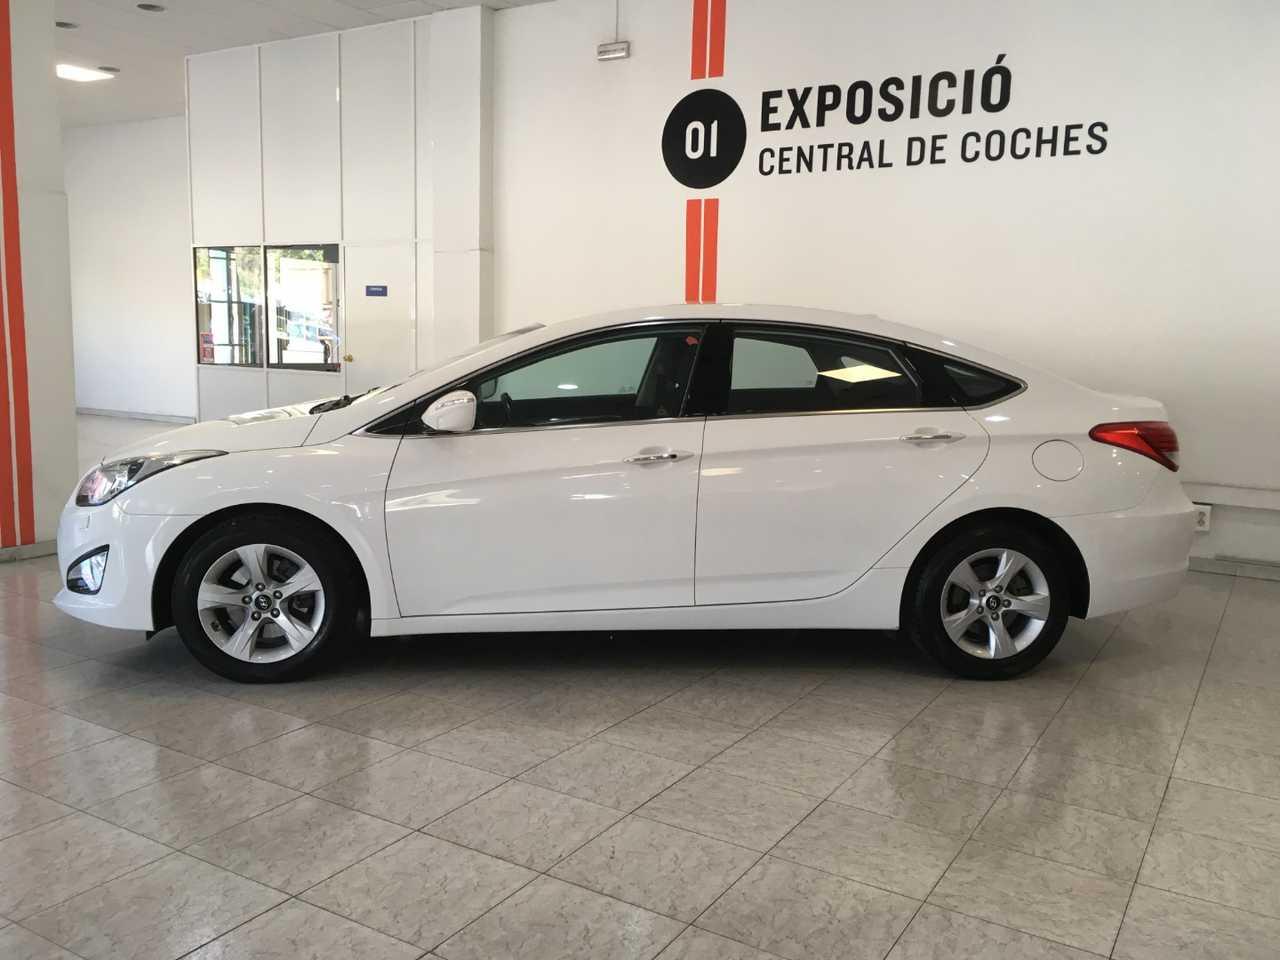 Hyundai i40 1.7 CRDI 136cv Aut. Bluedrive Tecno /Navi/Xenon/Partronic/Camara   - Foto 1